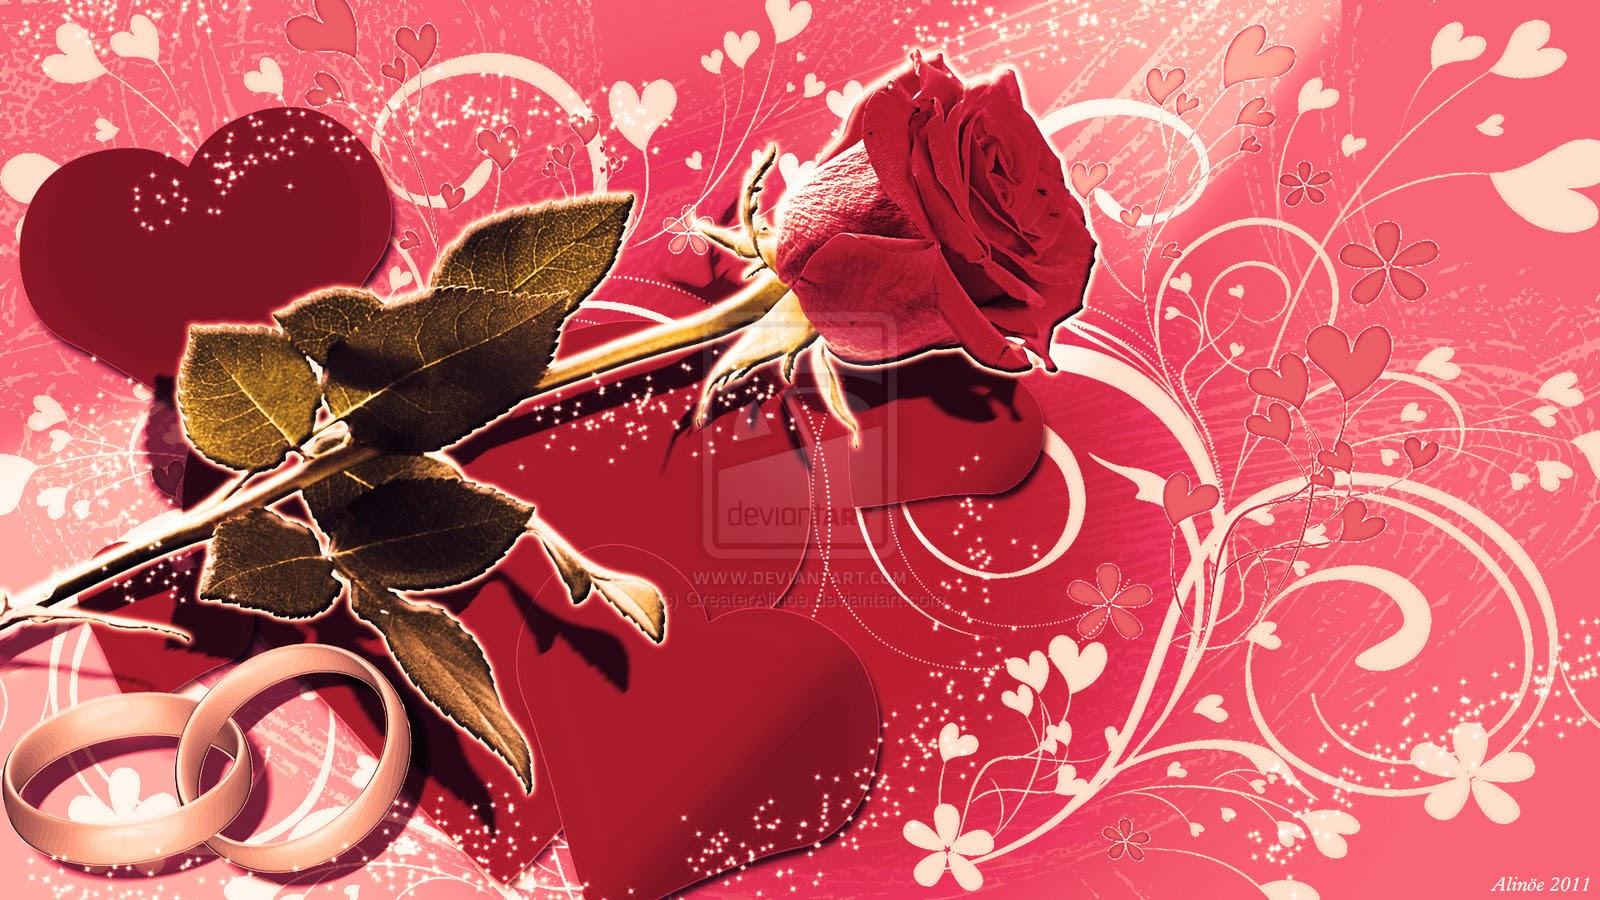 Id e carte de voeux mariage invitation mariage carte mariage texte mari - Idees cartes de voeux ...